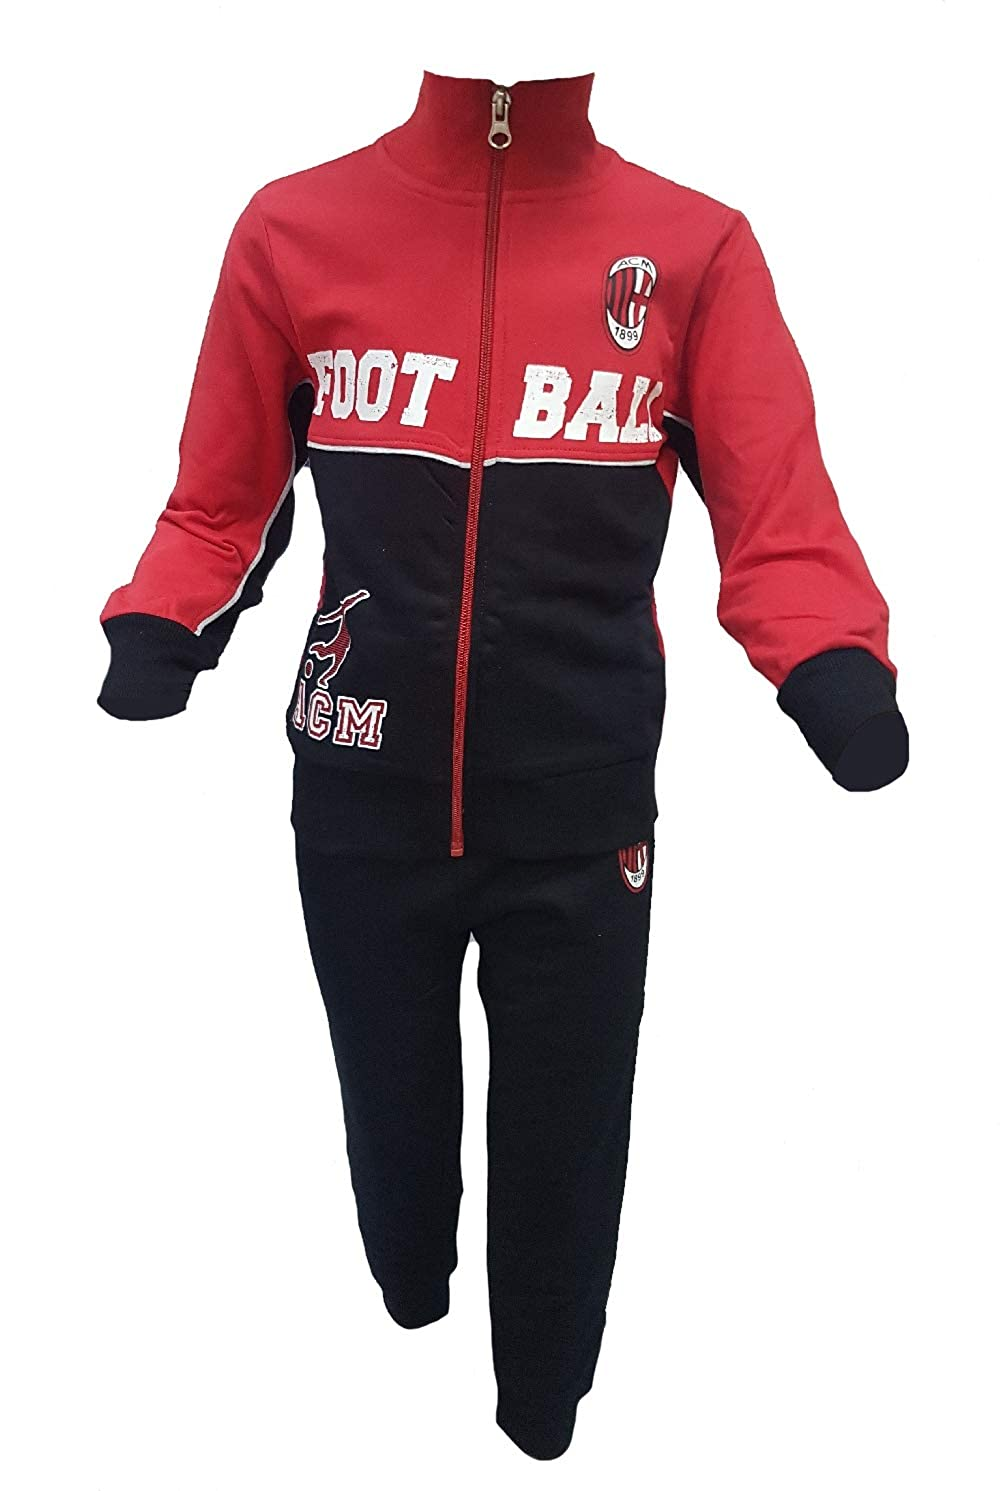 Tuta Bimbo Milan Calcio Abbigliamento AC Milan PS 27889 Arnetta